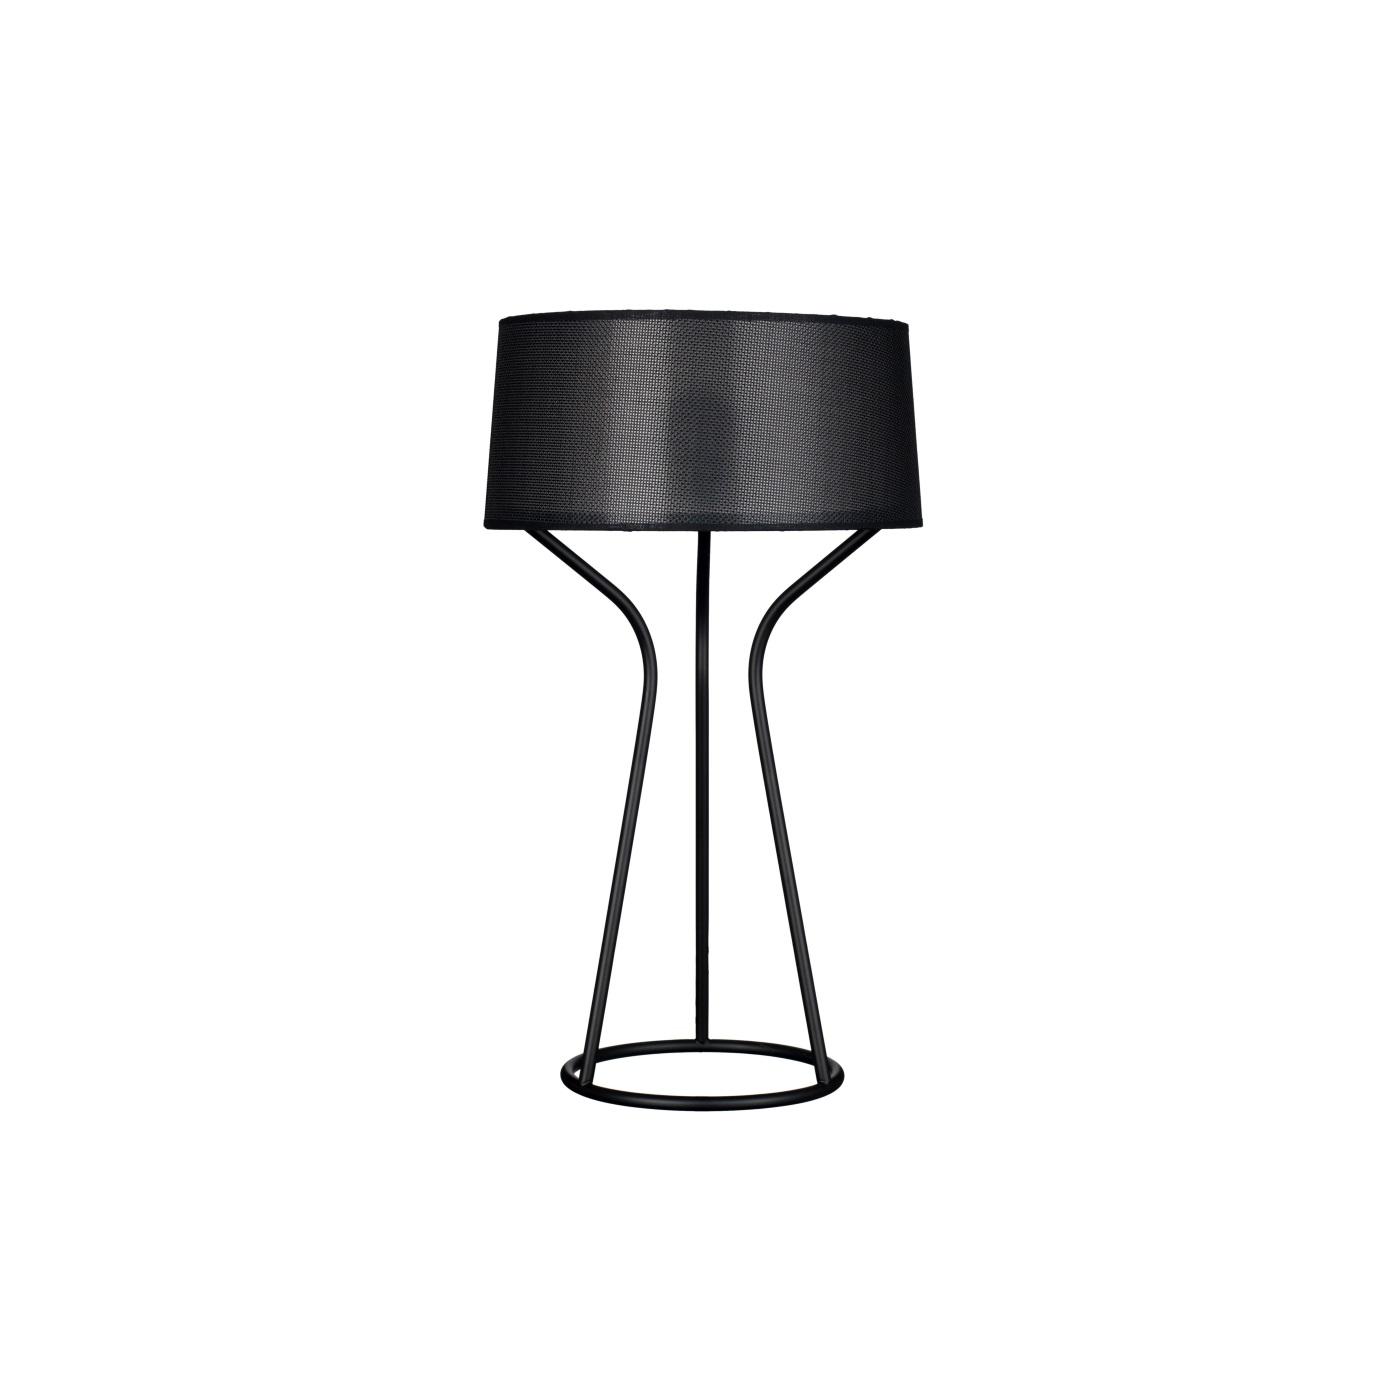 Bordslampa ARIA svart, Örsjö belysning thumbnail